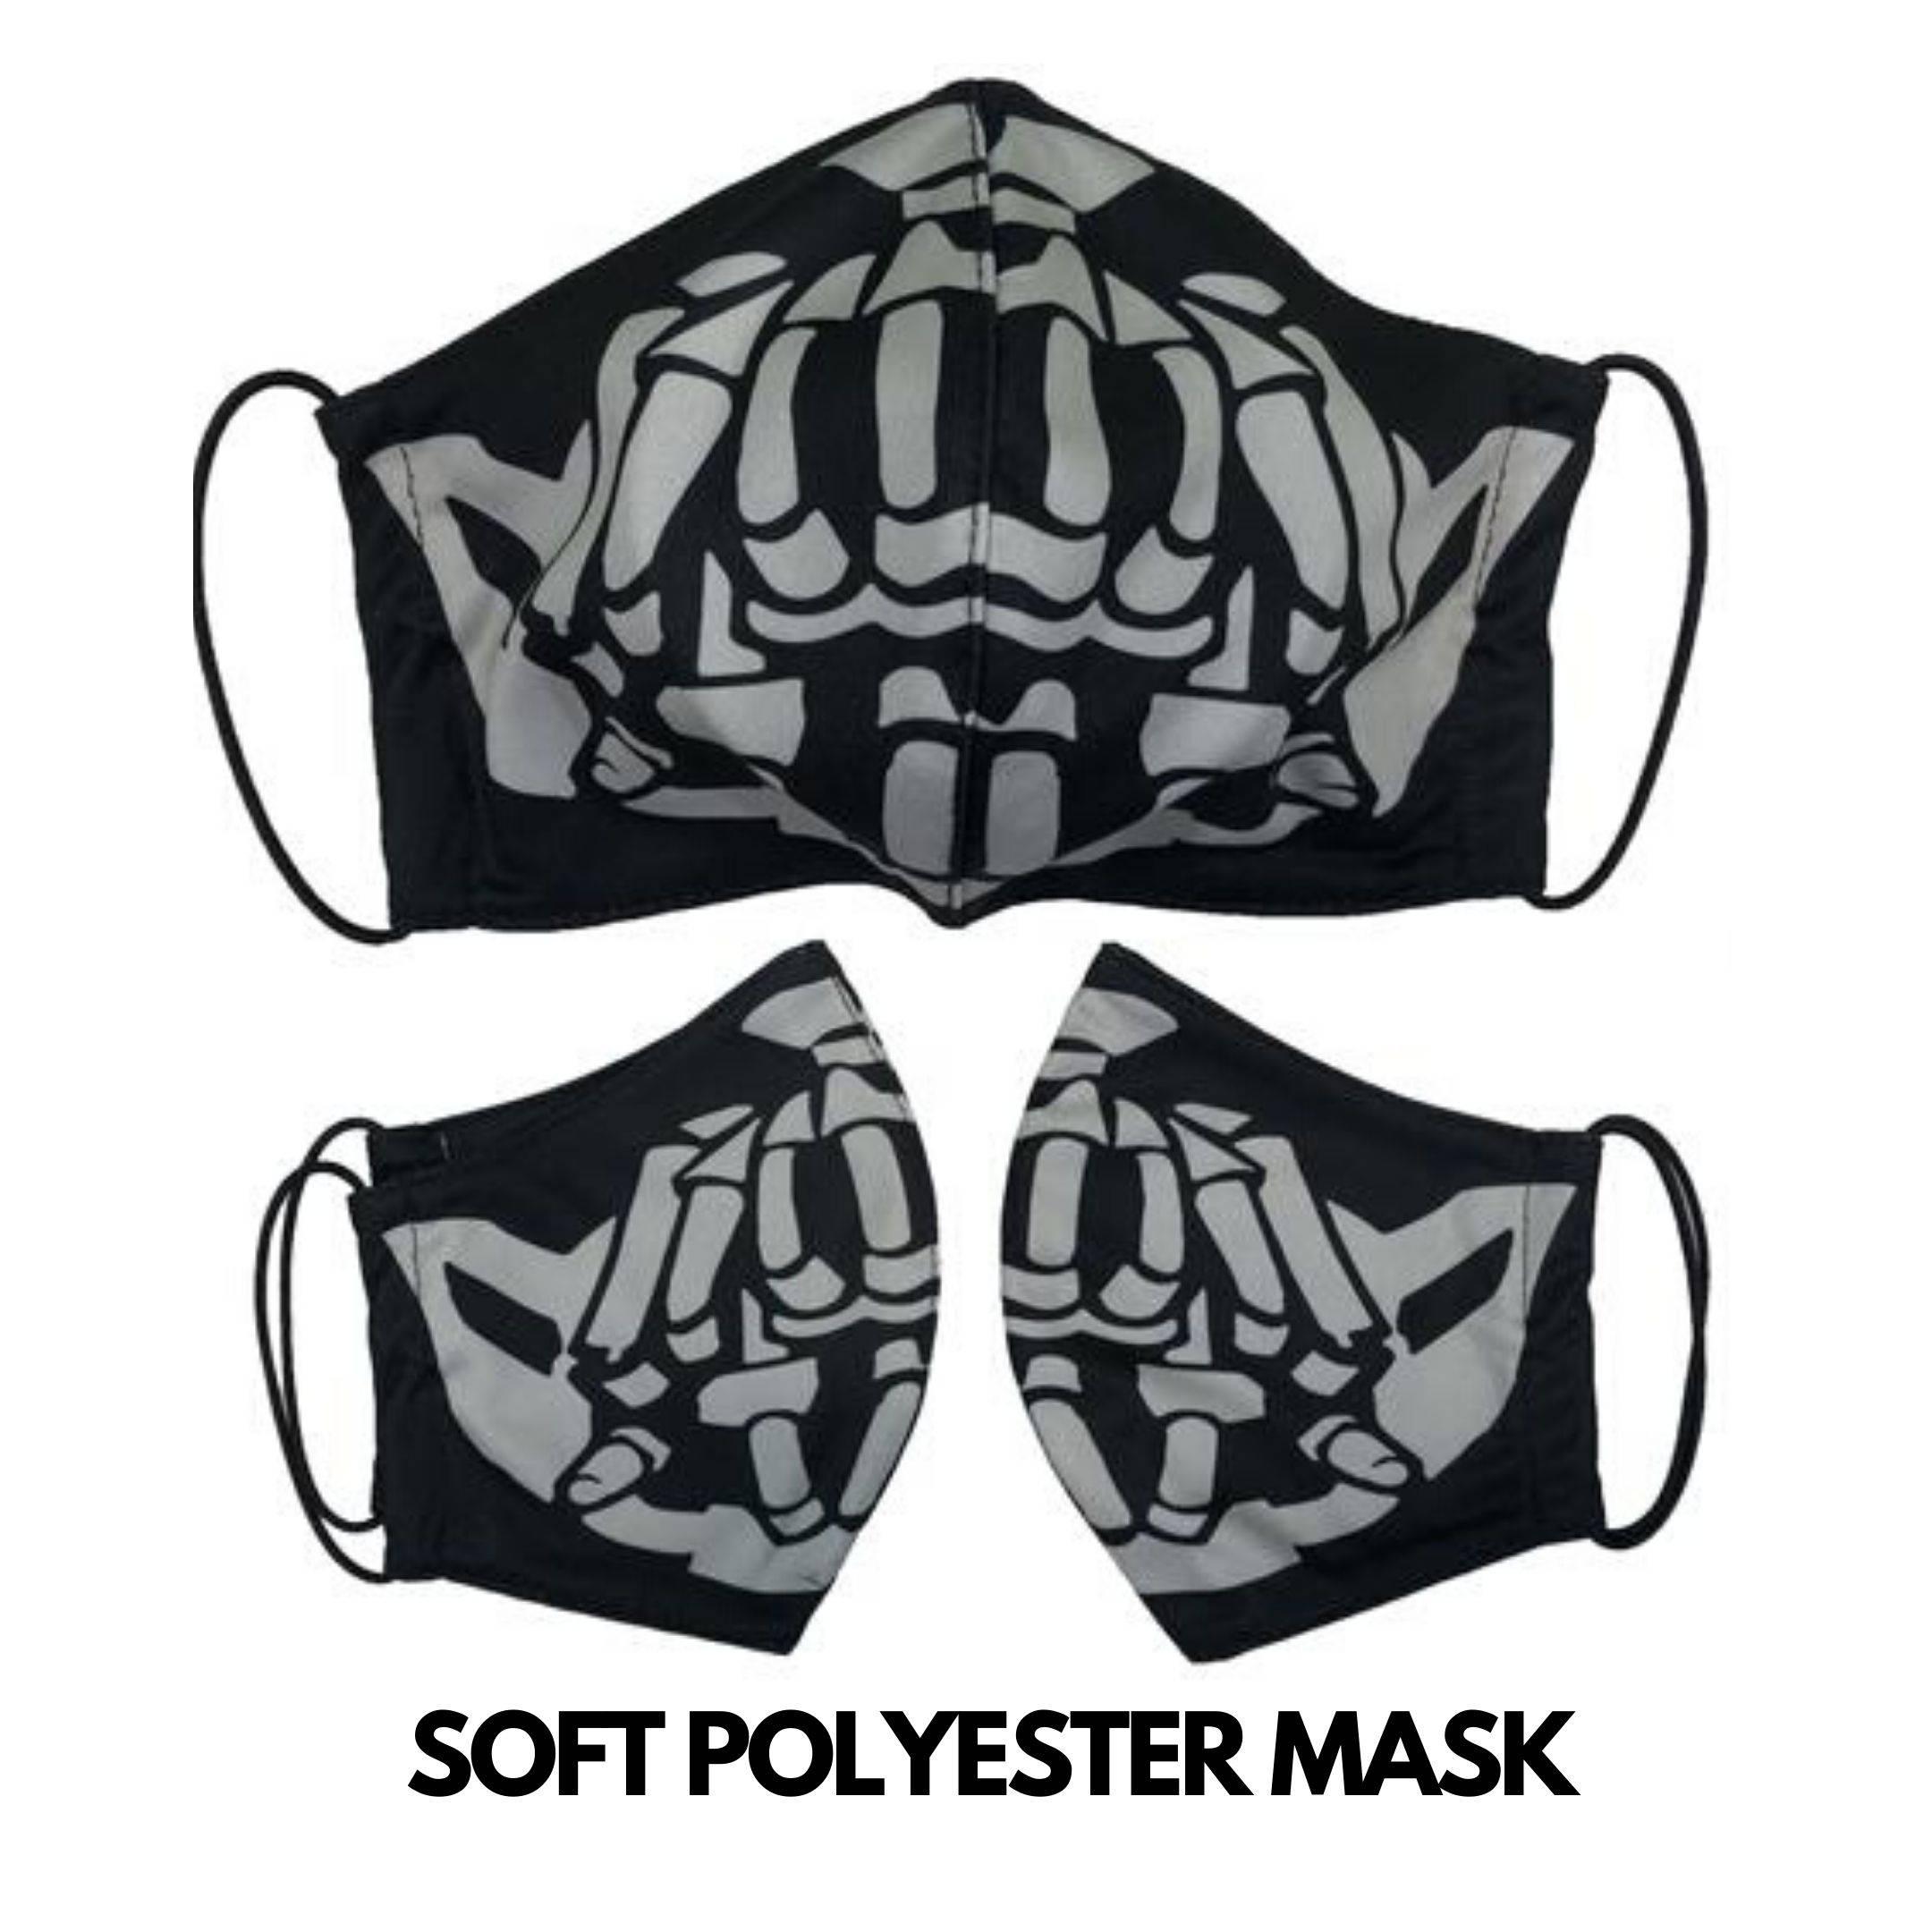 soft polyester mask